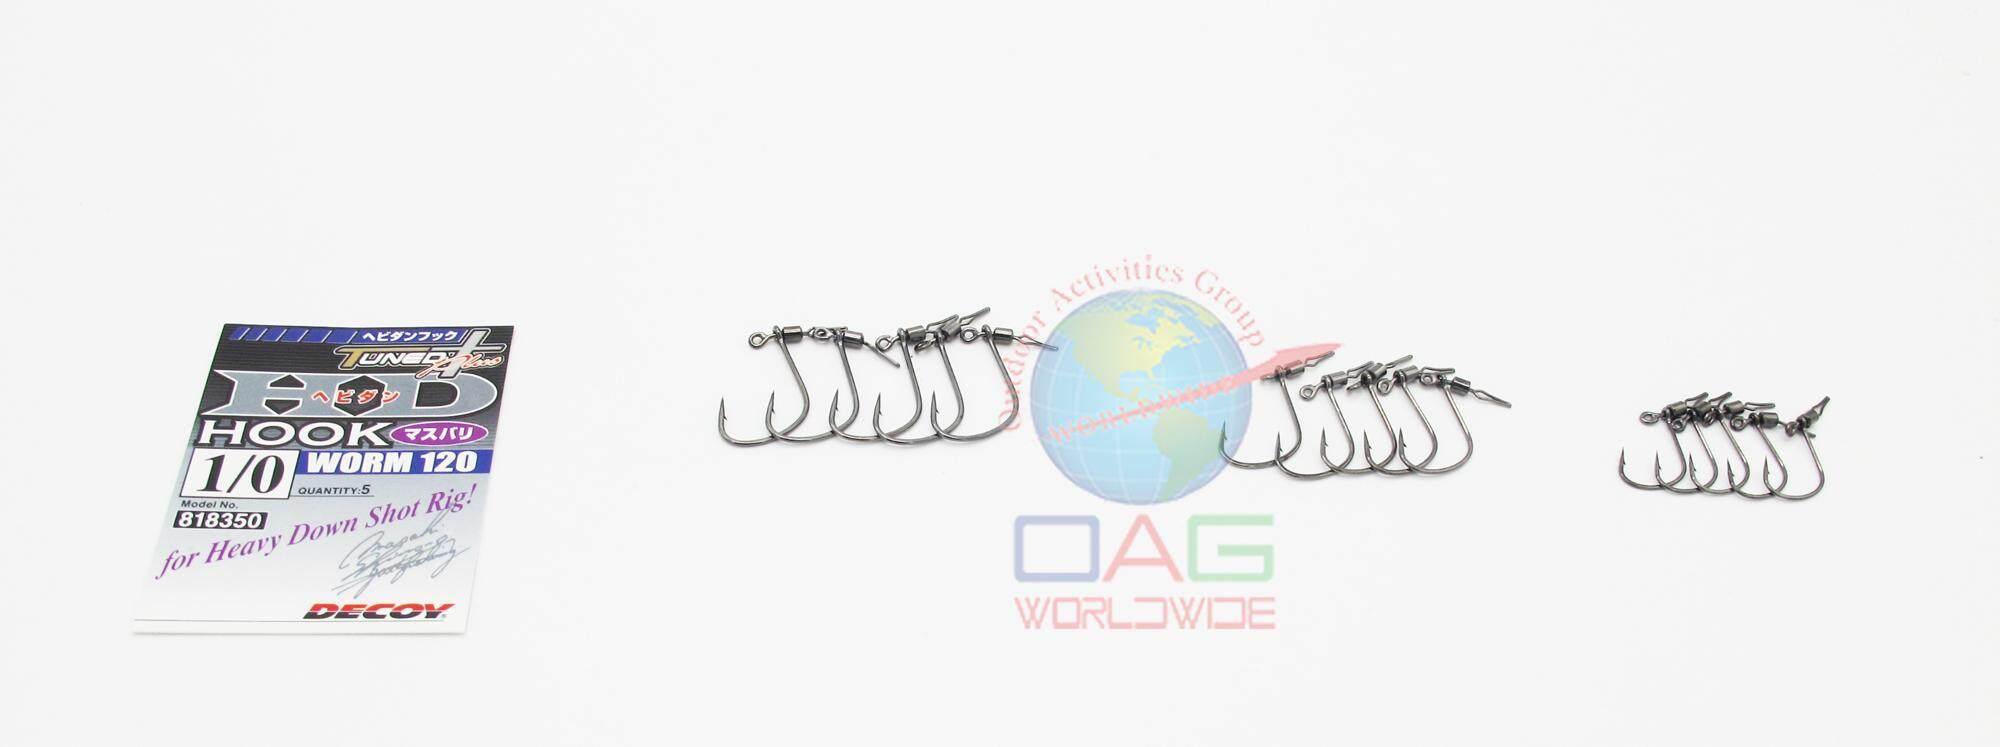 Decoy Worm 120 - HD Hooks